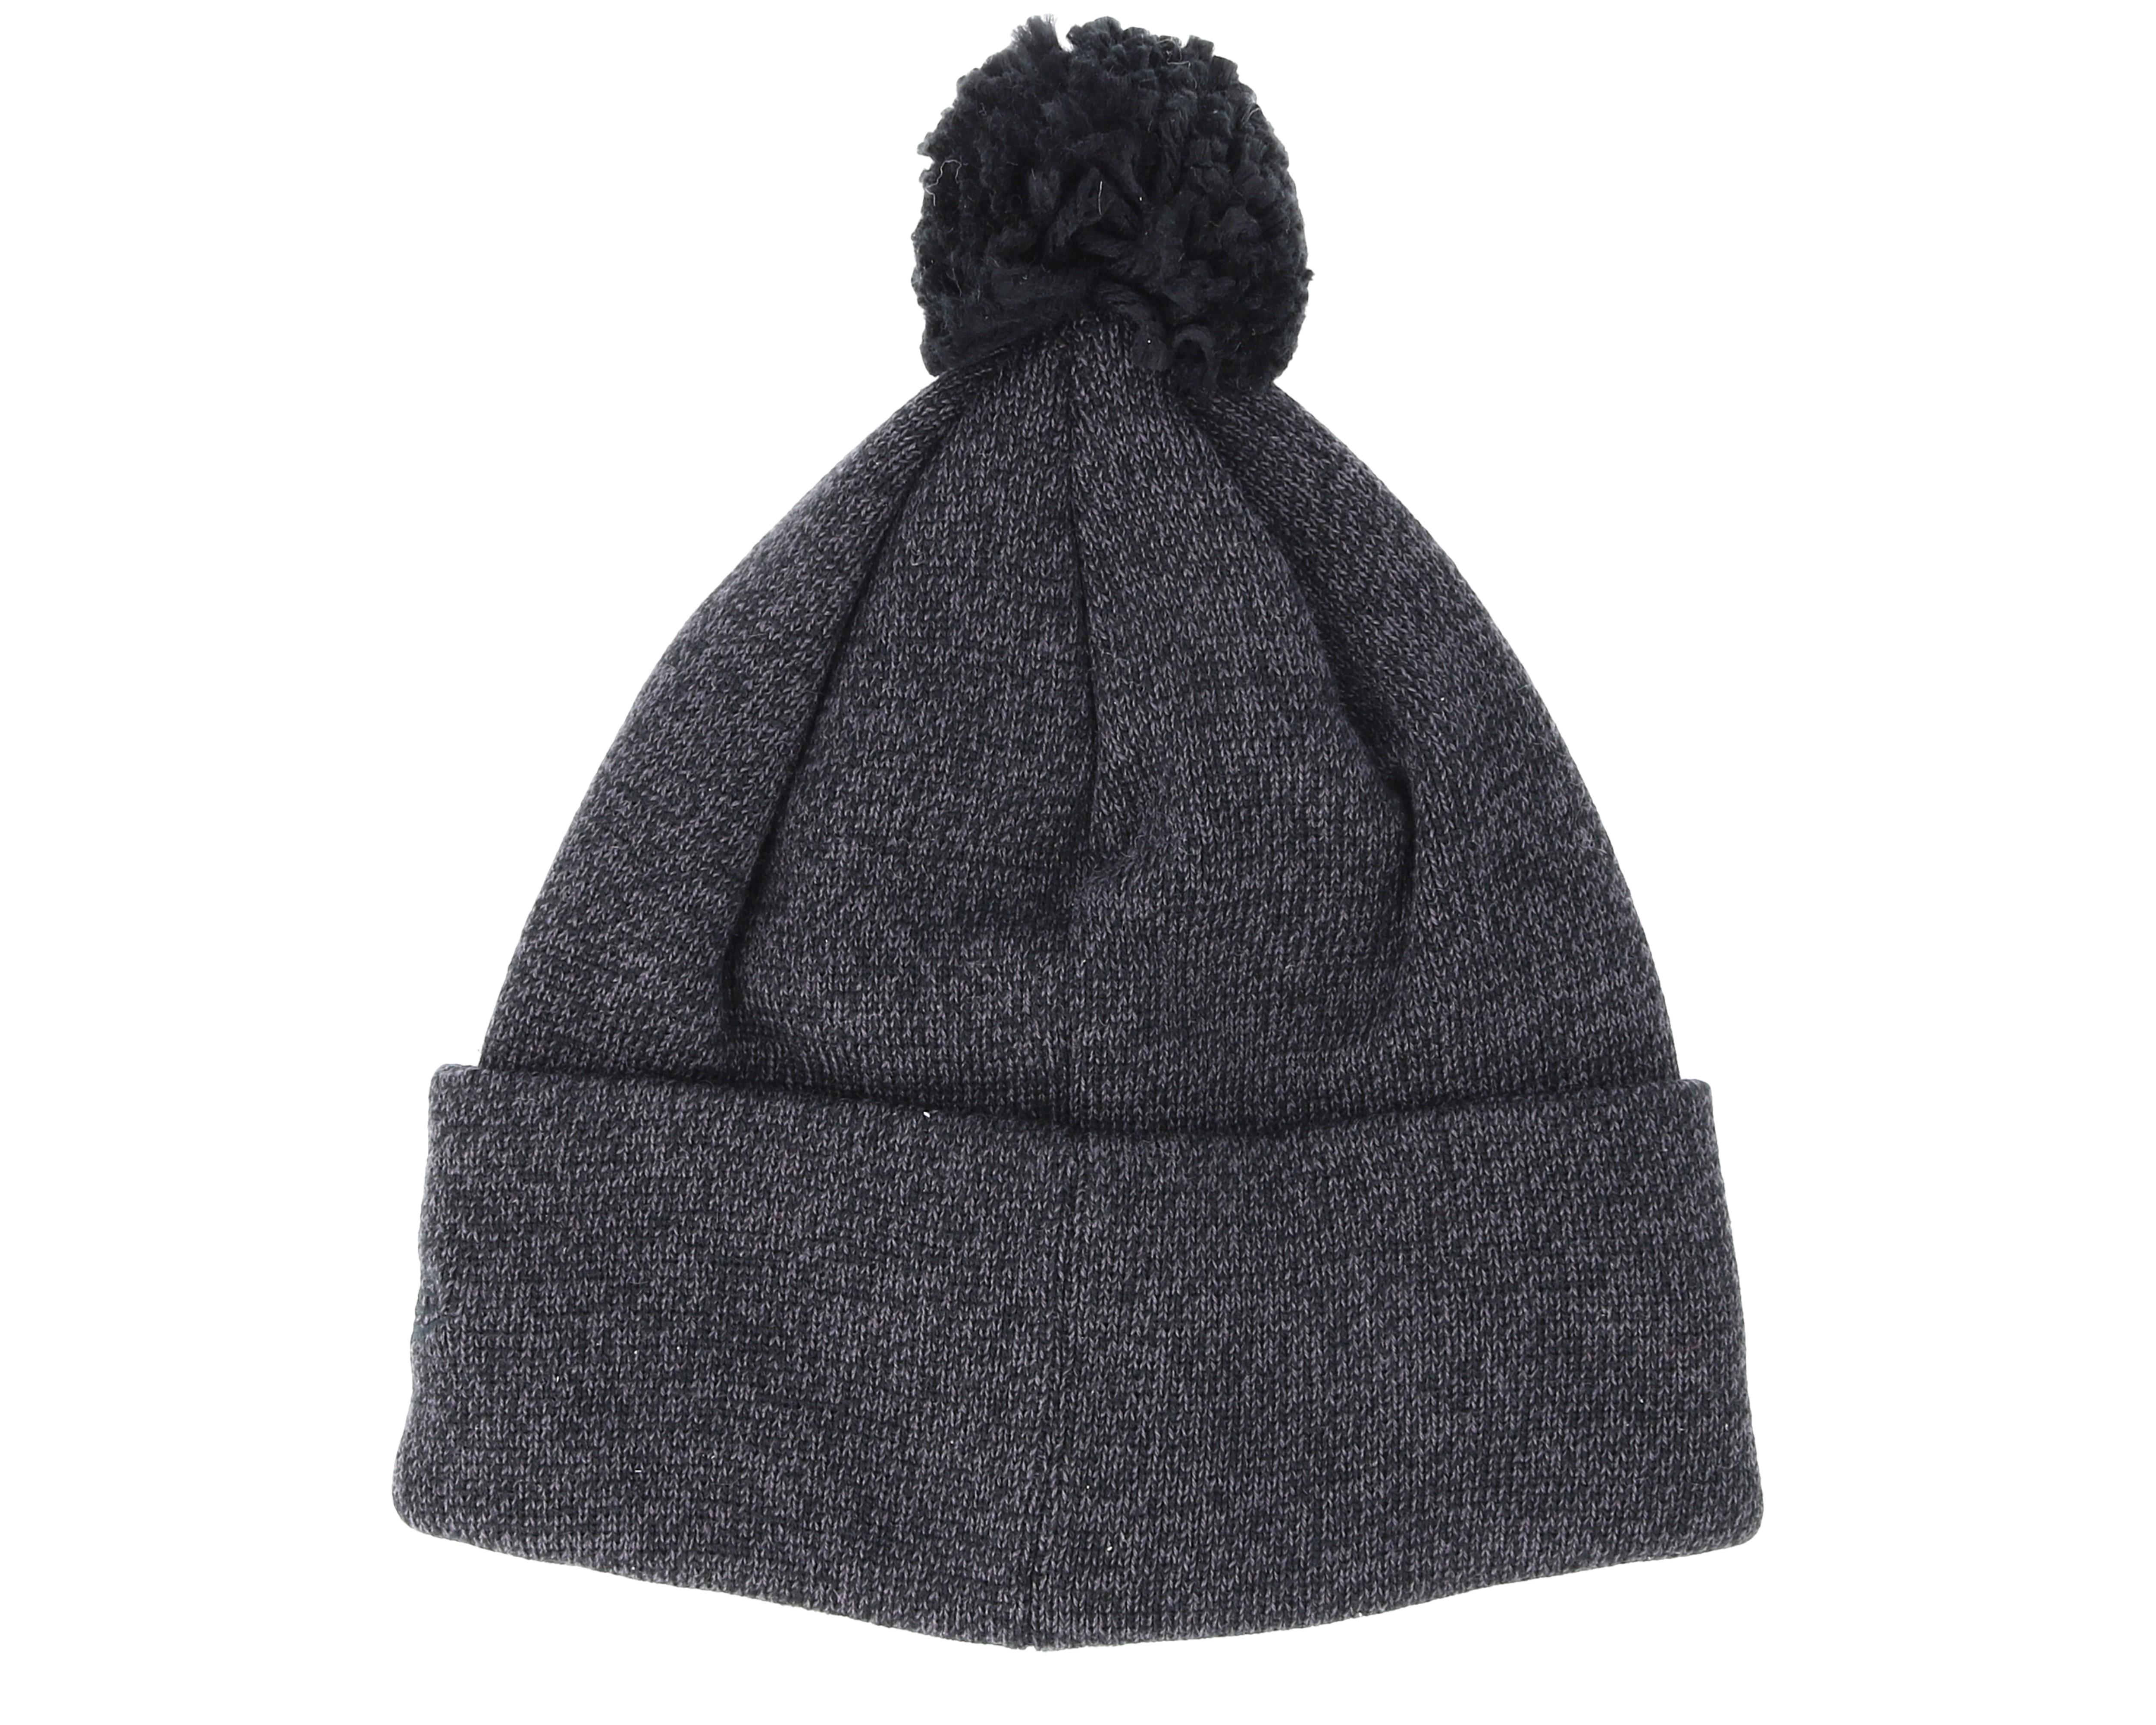 los angeles dodgers womens essential bobble knit black. Black Bedroom Furniture Sets. Home Design Ideas